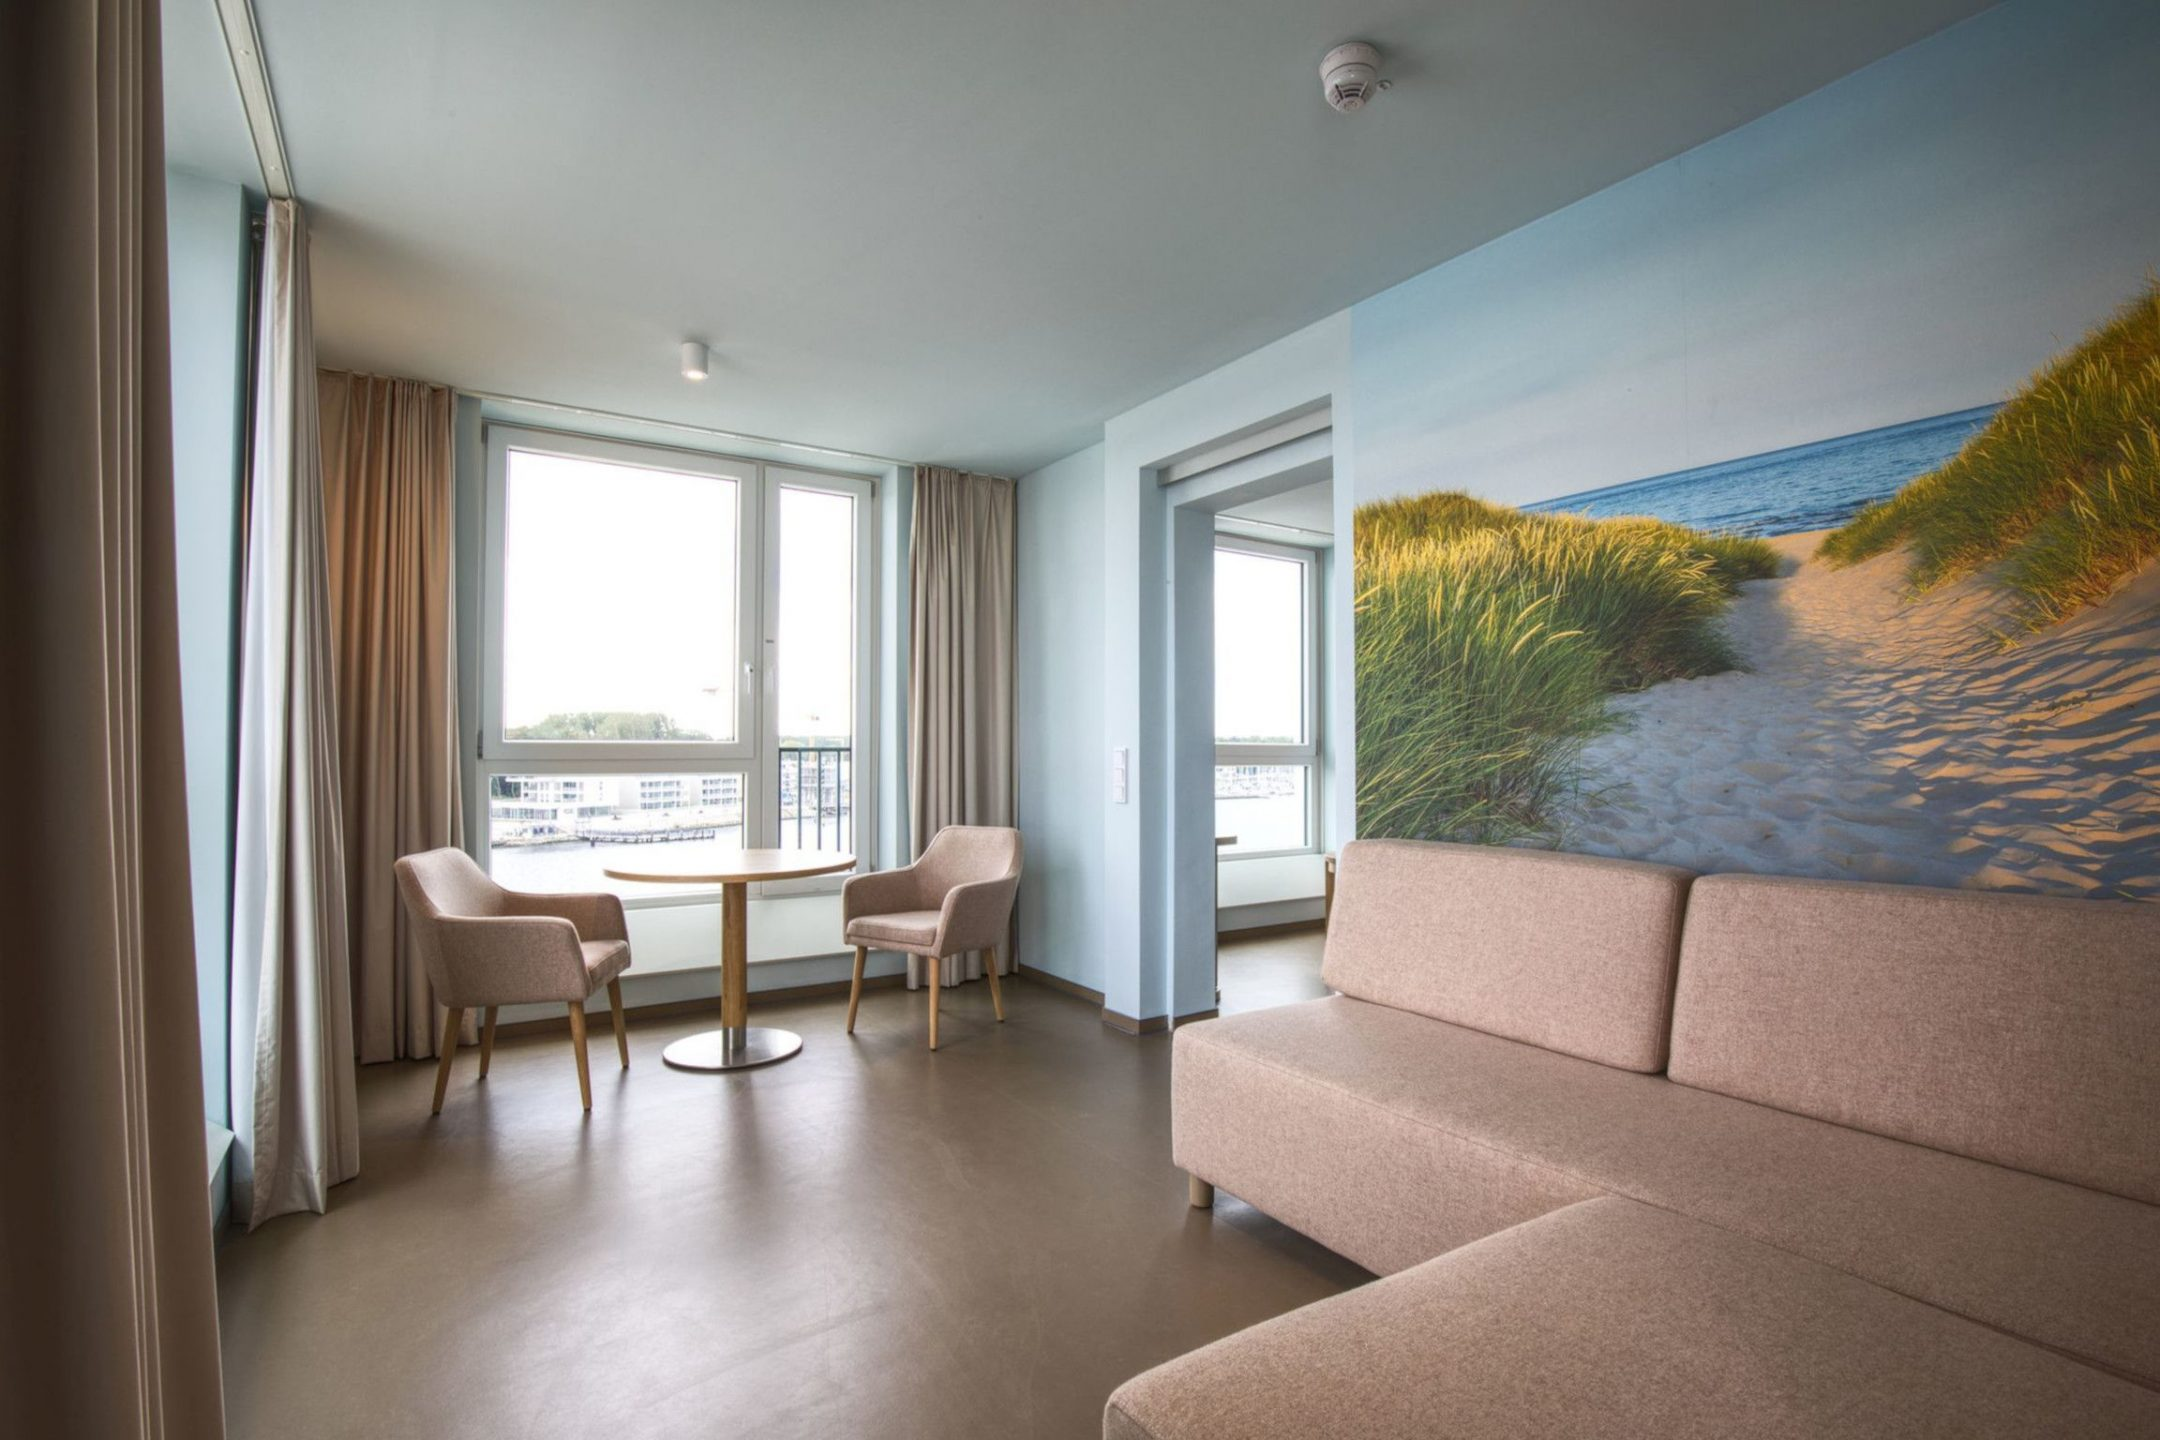 Aja travem nde das resort for Aja resort warnemunde suite